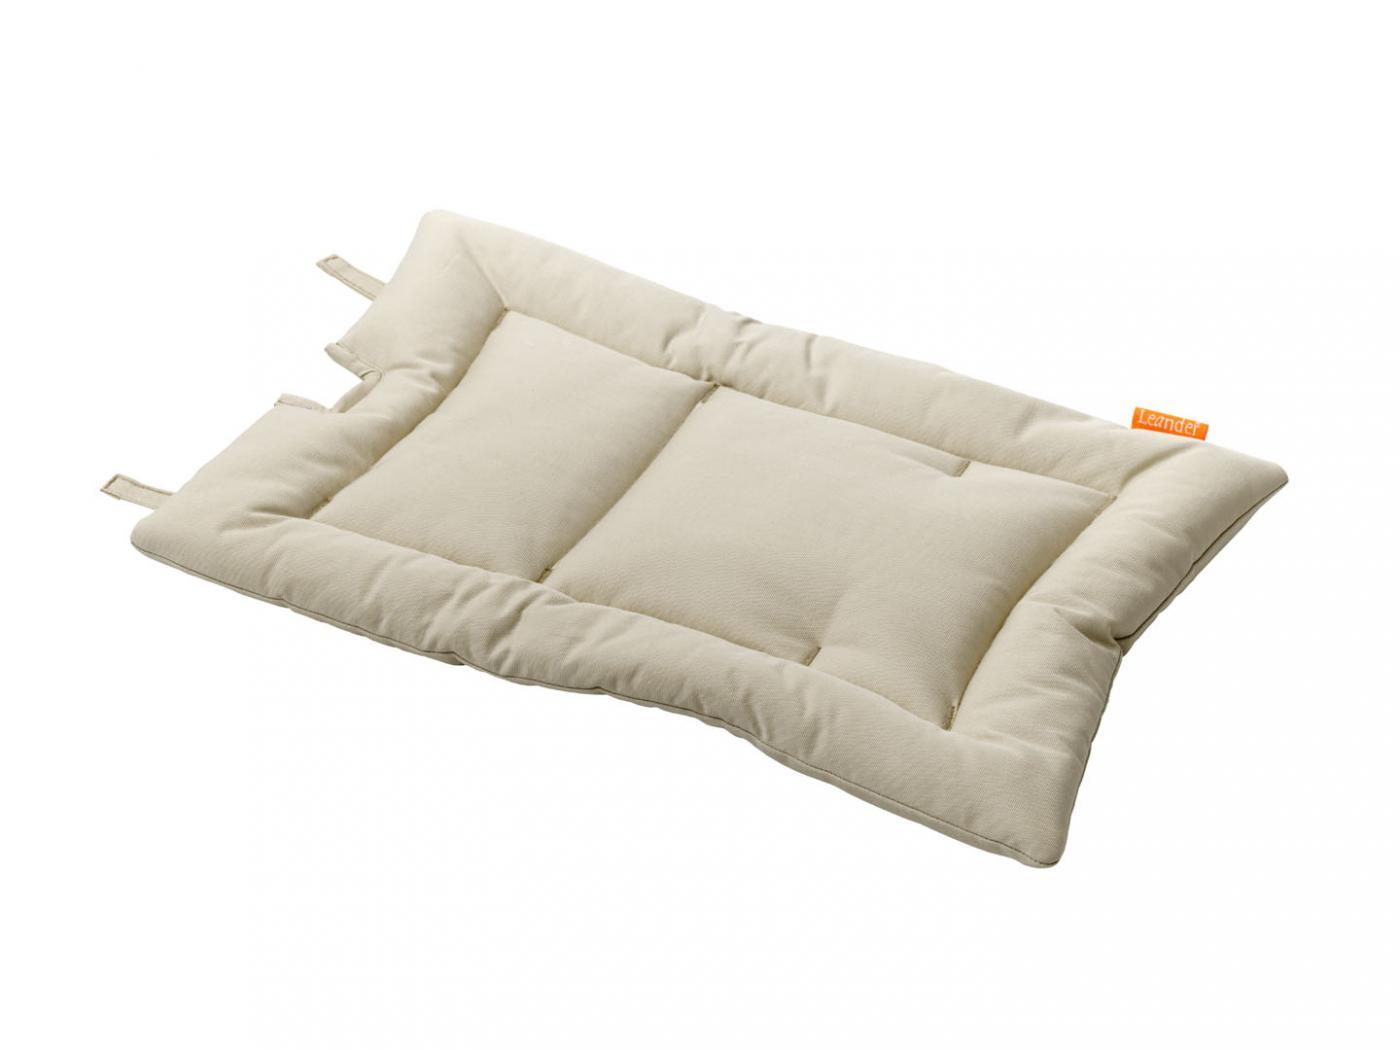 leander coussin chaise haute vanille. Black Bedroom Furniture Sets. Home Design Ideas